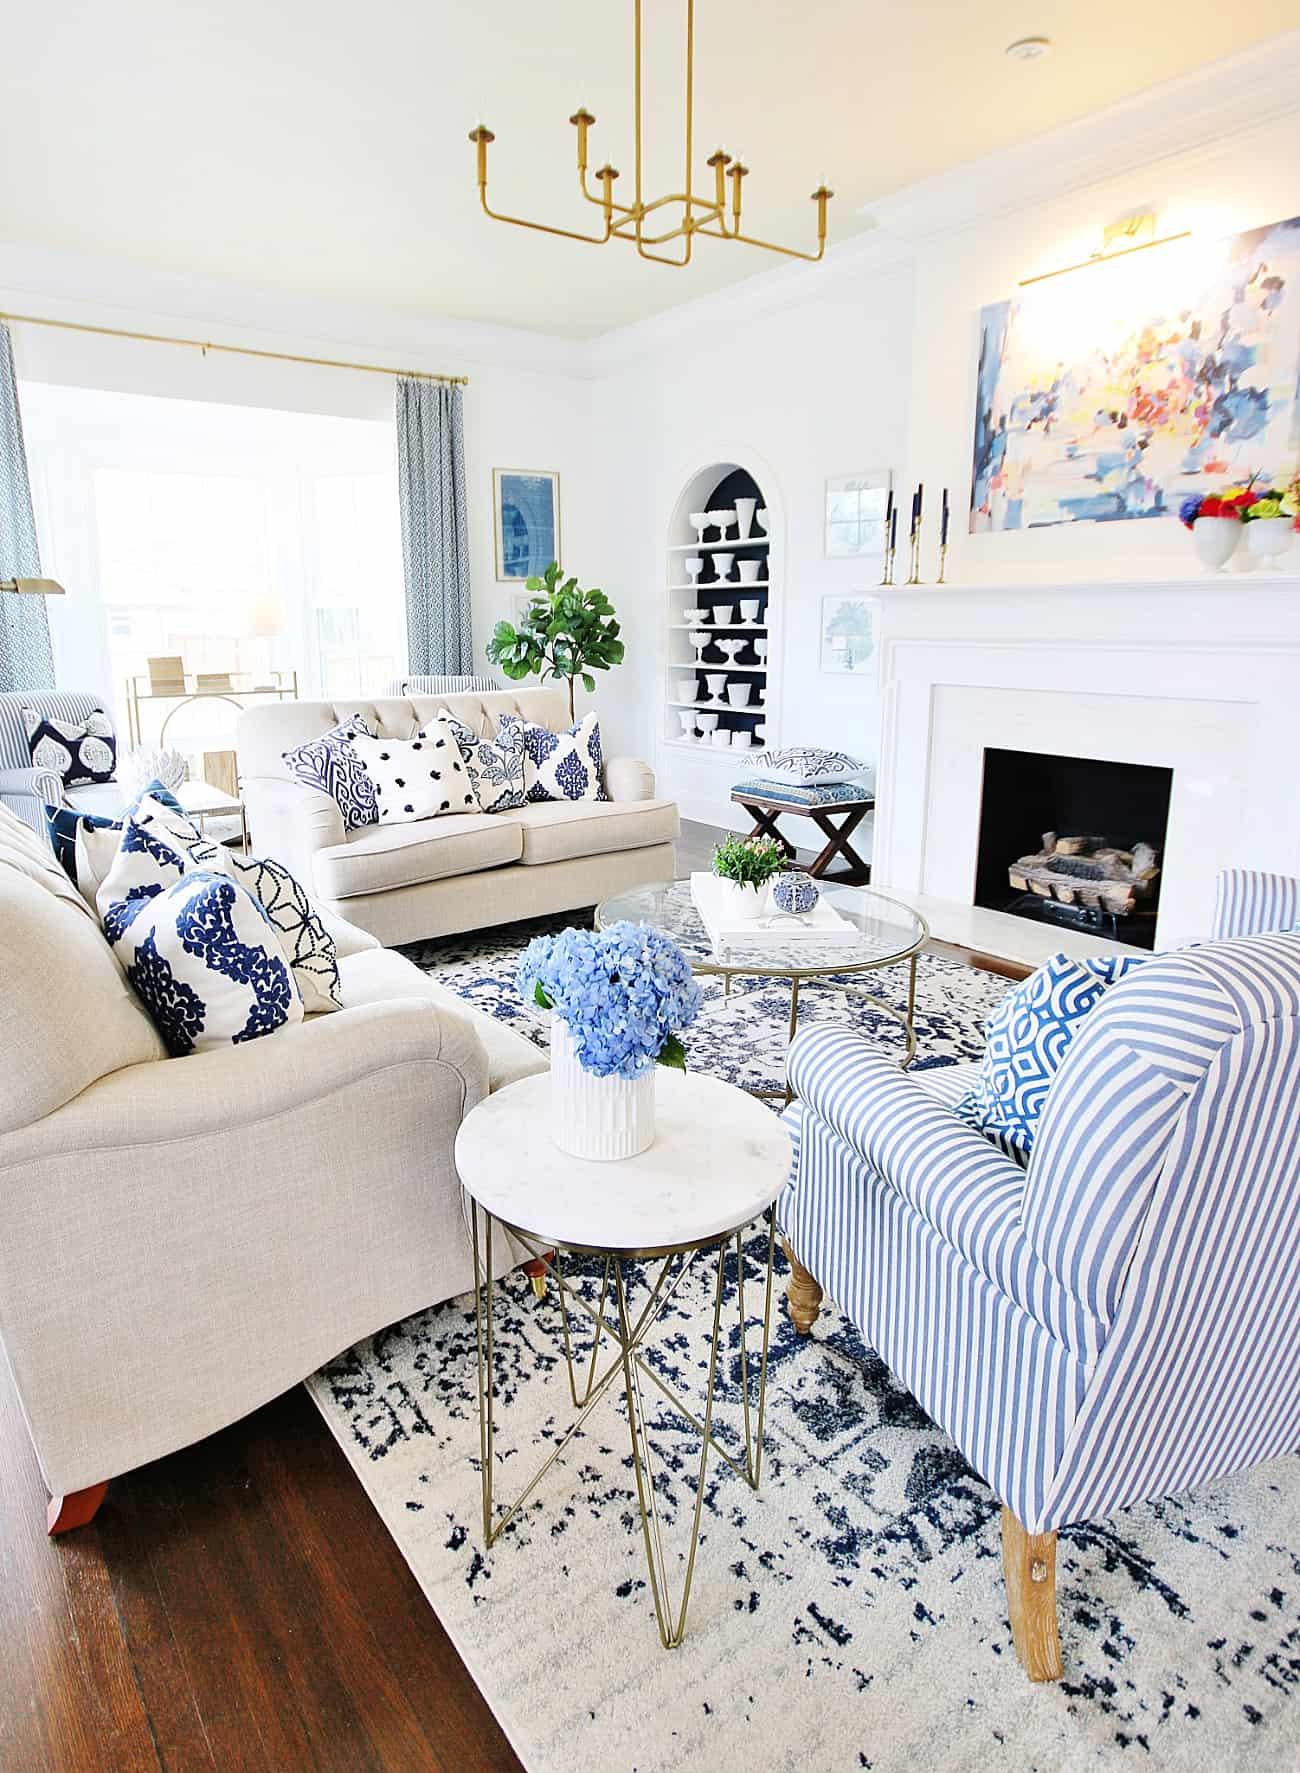 decorating ideas for spring living room decor